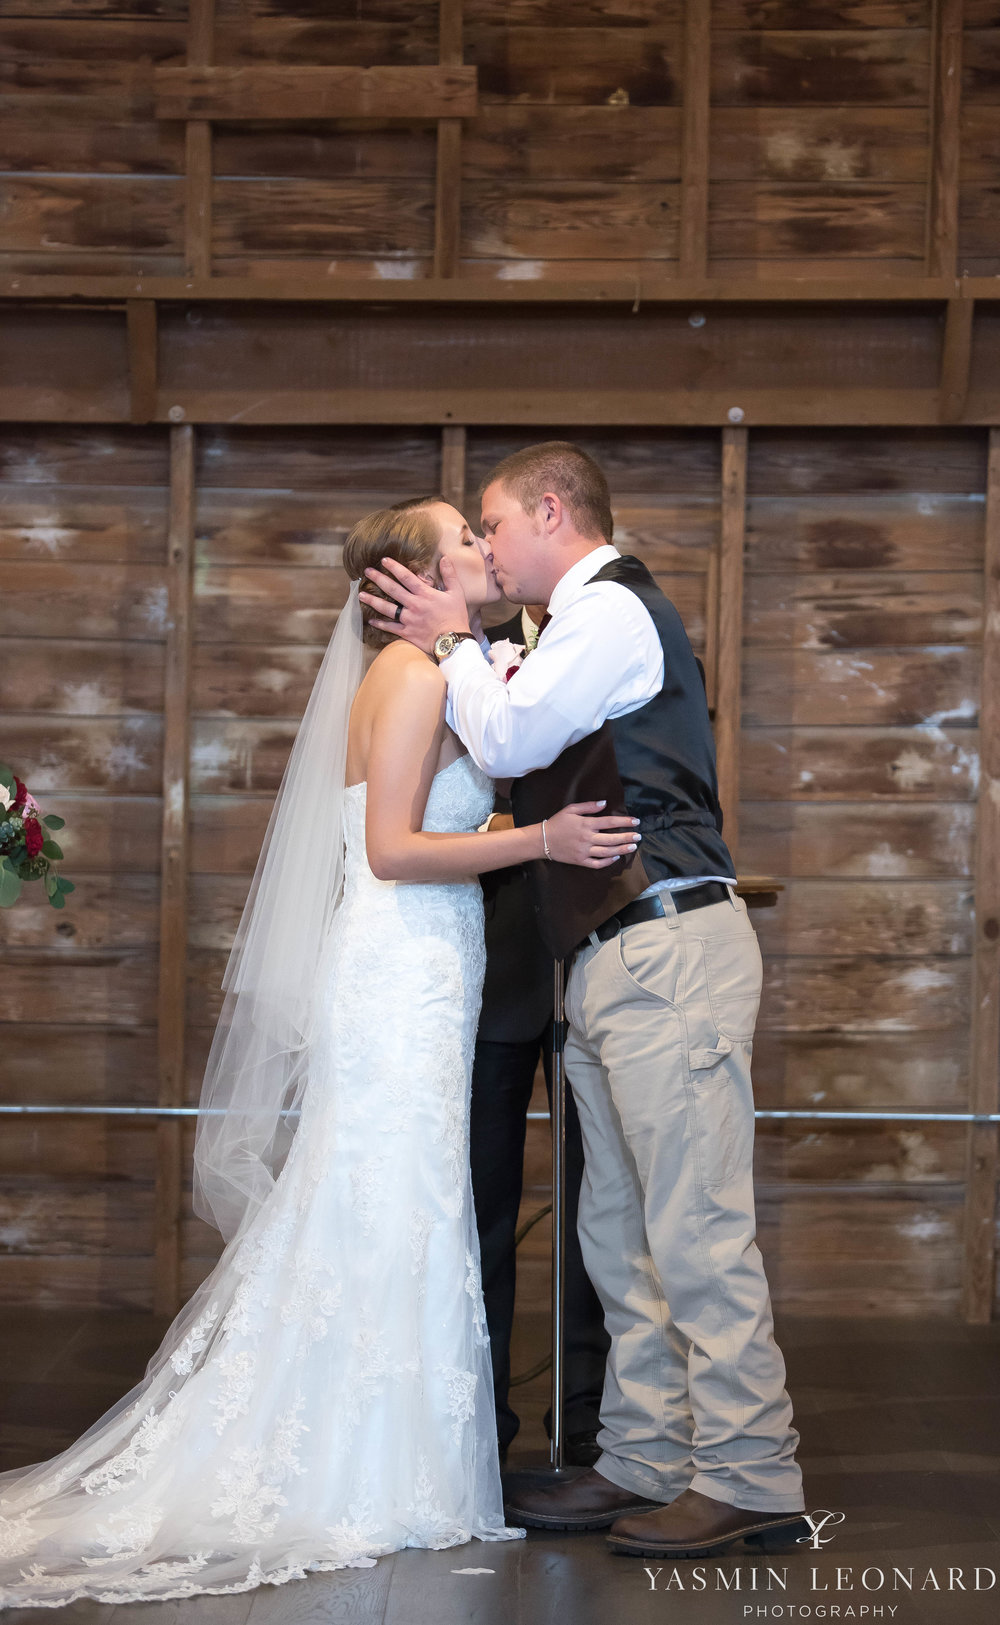 Millikan Farms - NC Wedding Venue - NC Wedding Photographer - Yasmin Leonard Photography - Rain on your wedding day-34.jpg